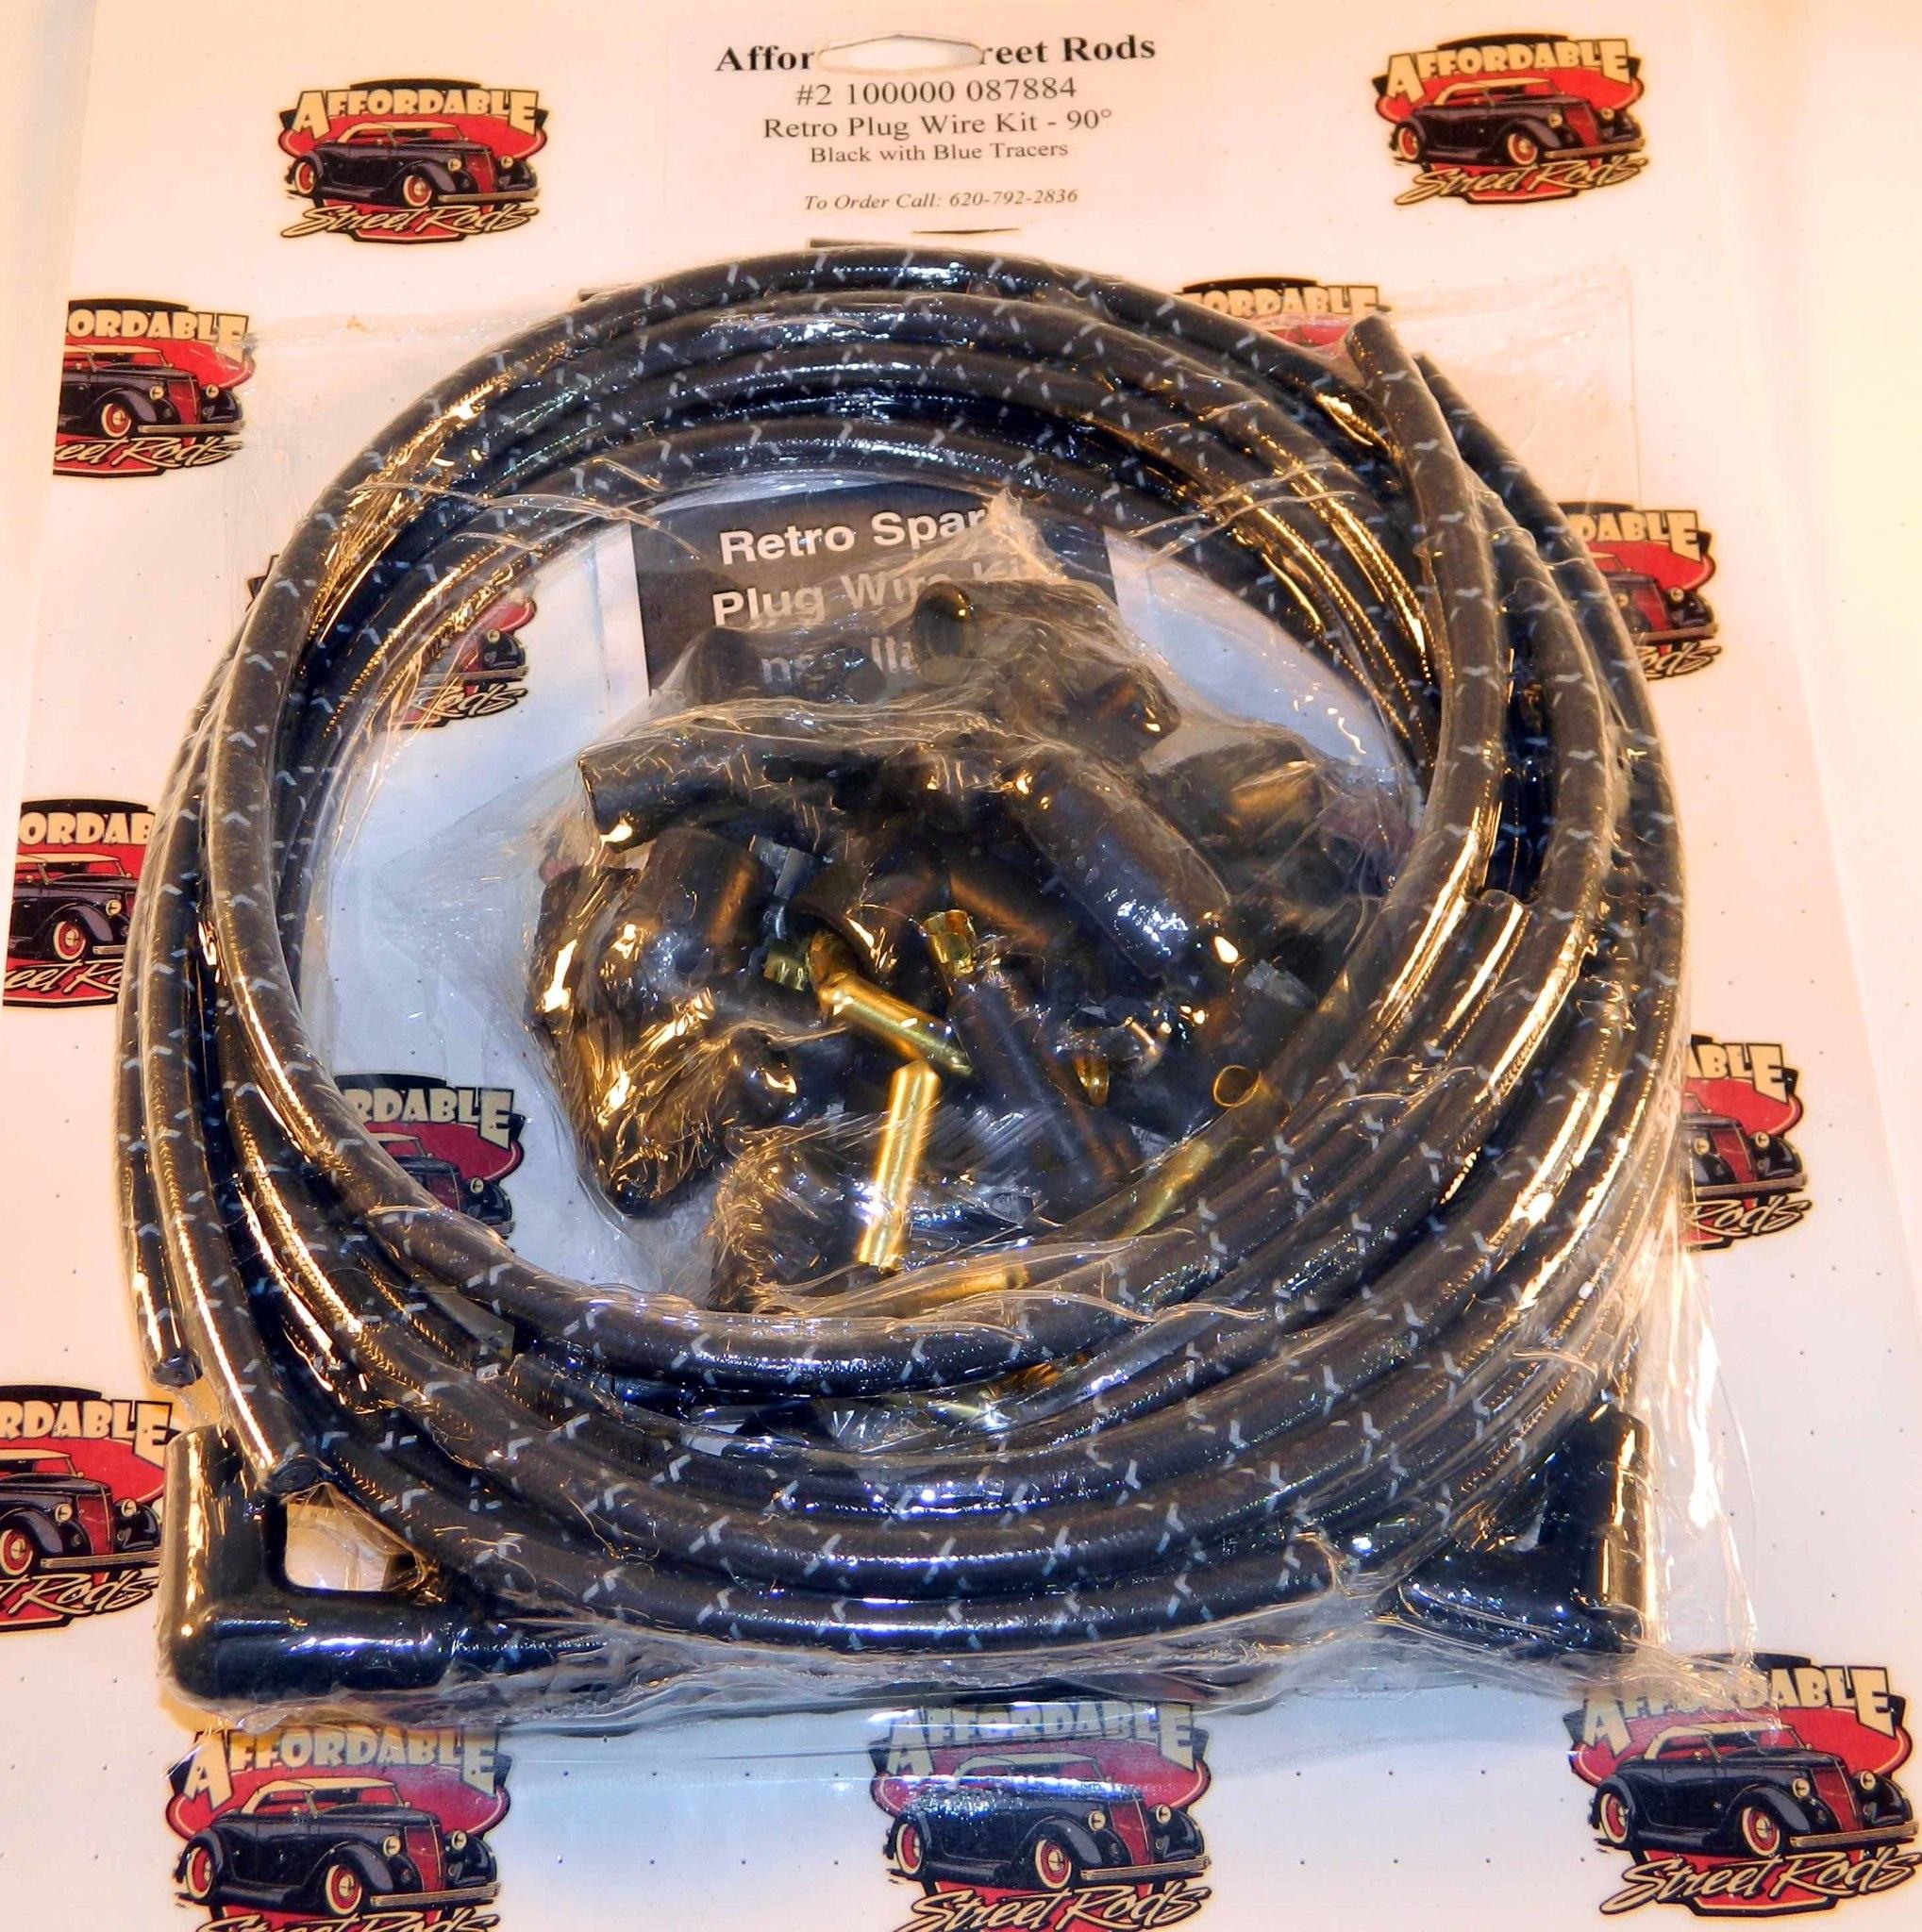 retro 90� plug wire kit black w blue tracers  x 6ft vintage hot rod wire loom